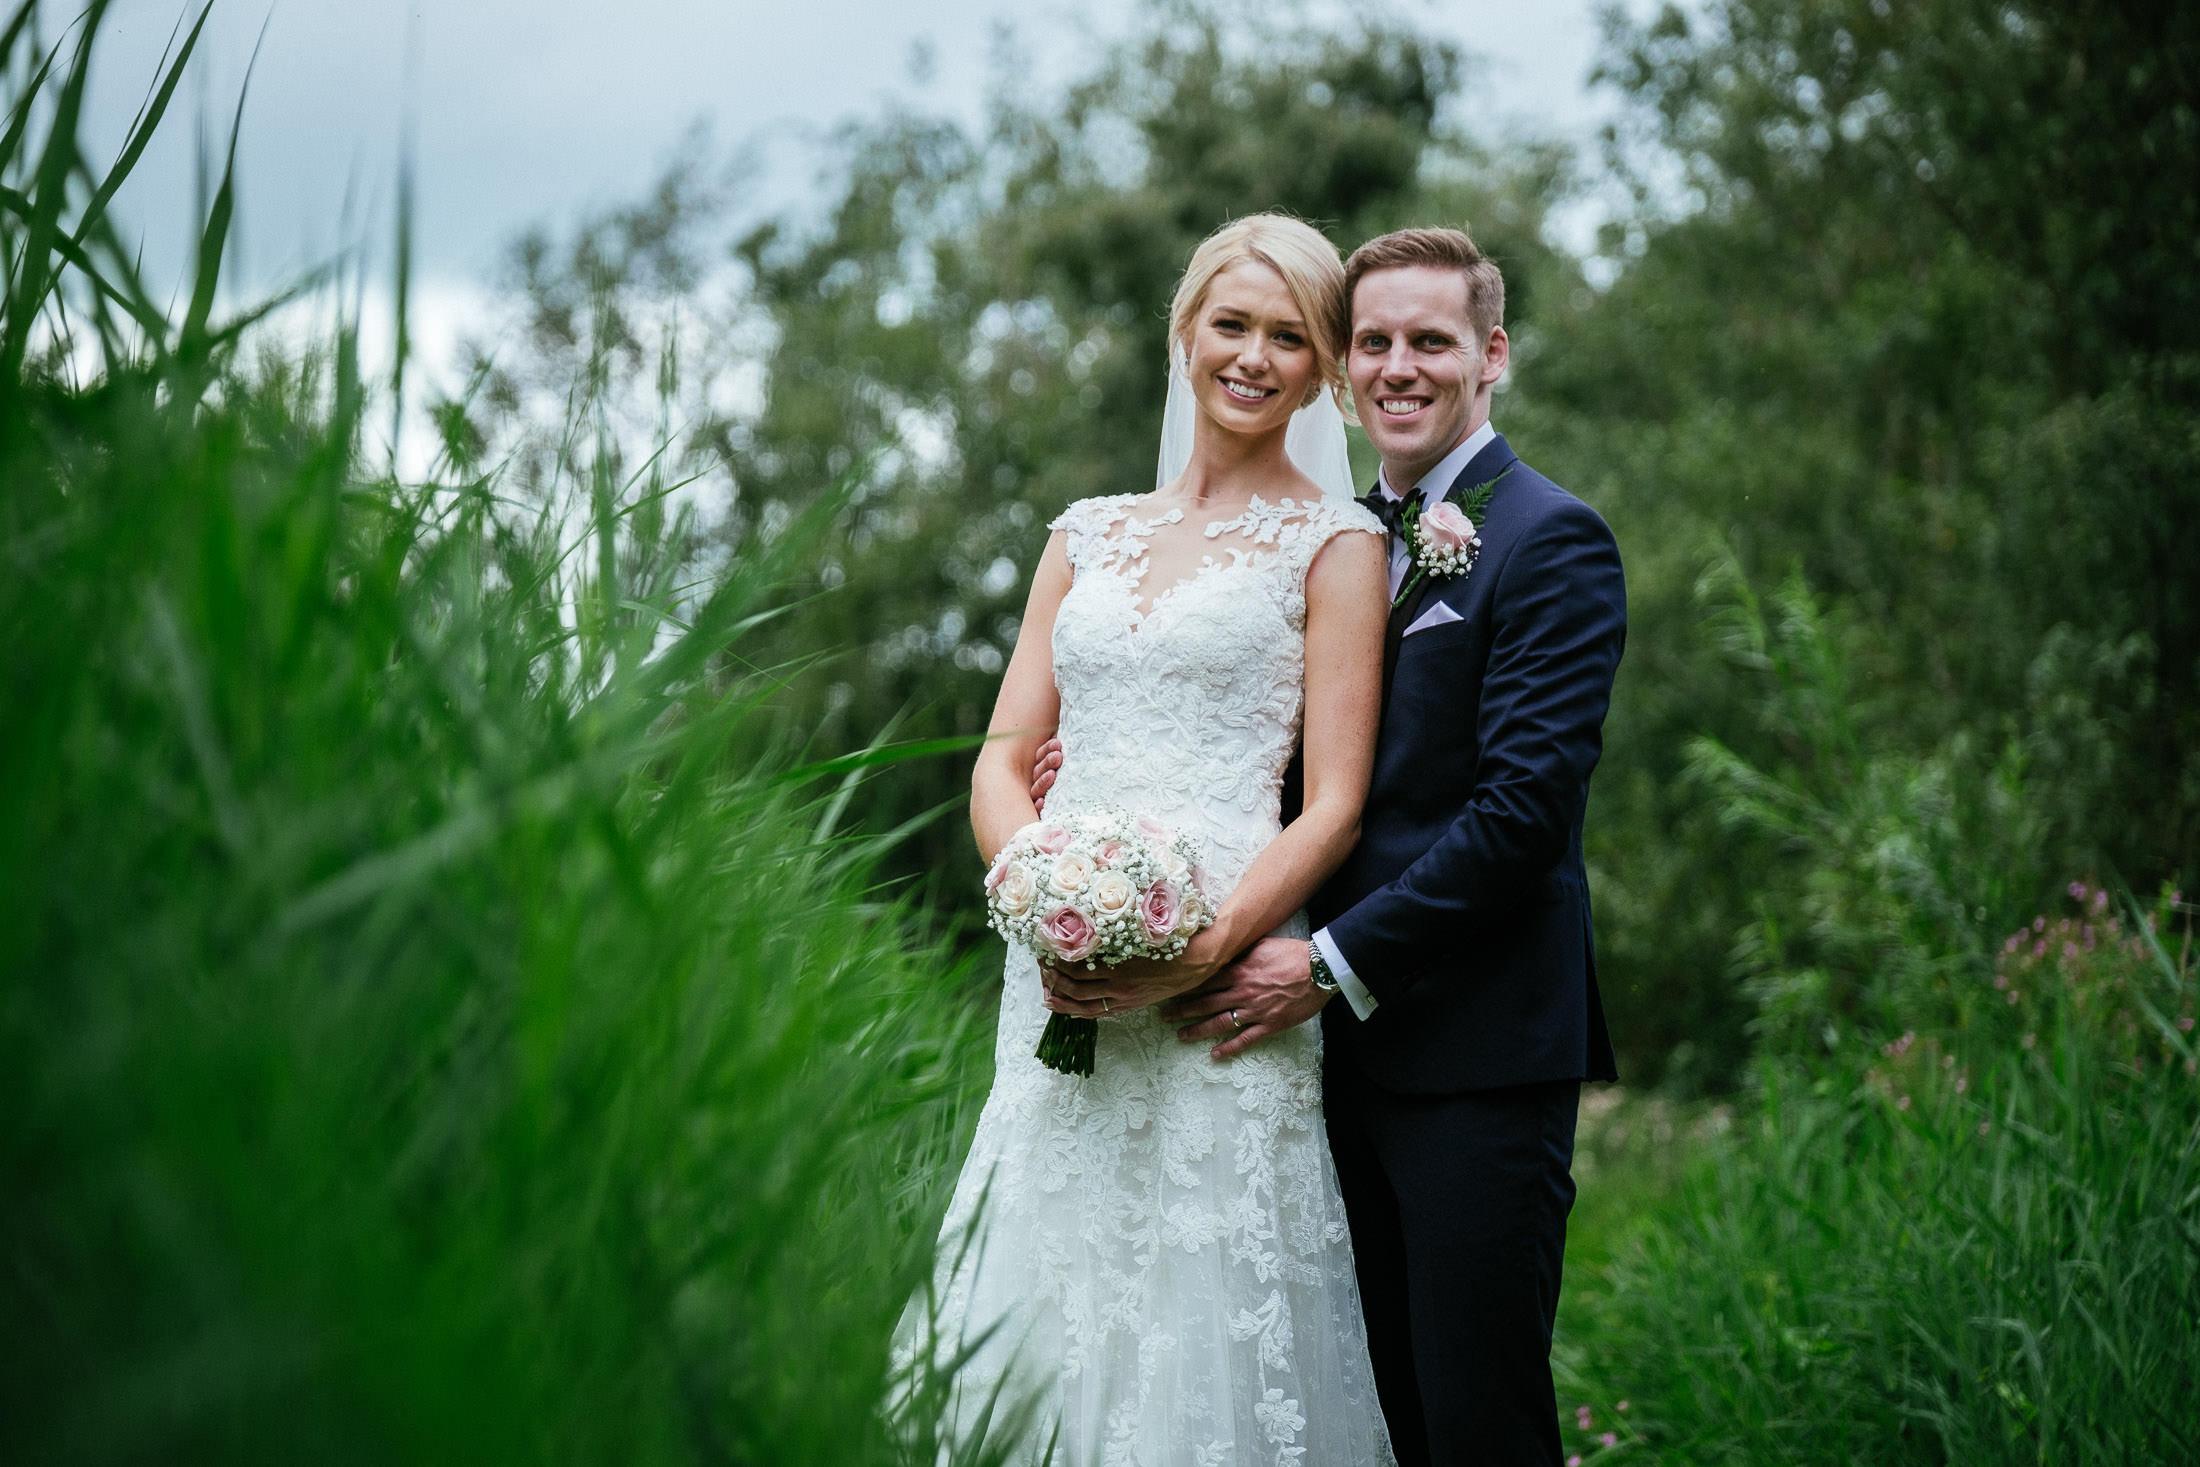 Knightsbrook Hotel Trim Castle Wedding Photographer 80